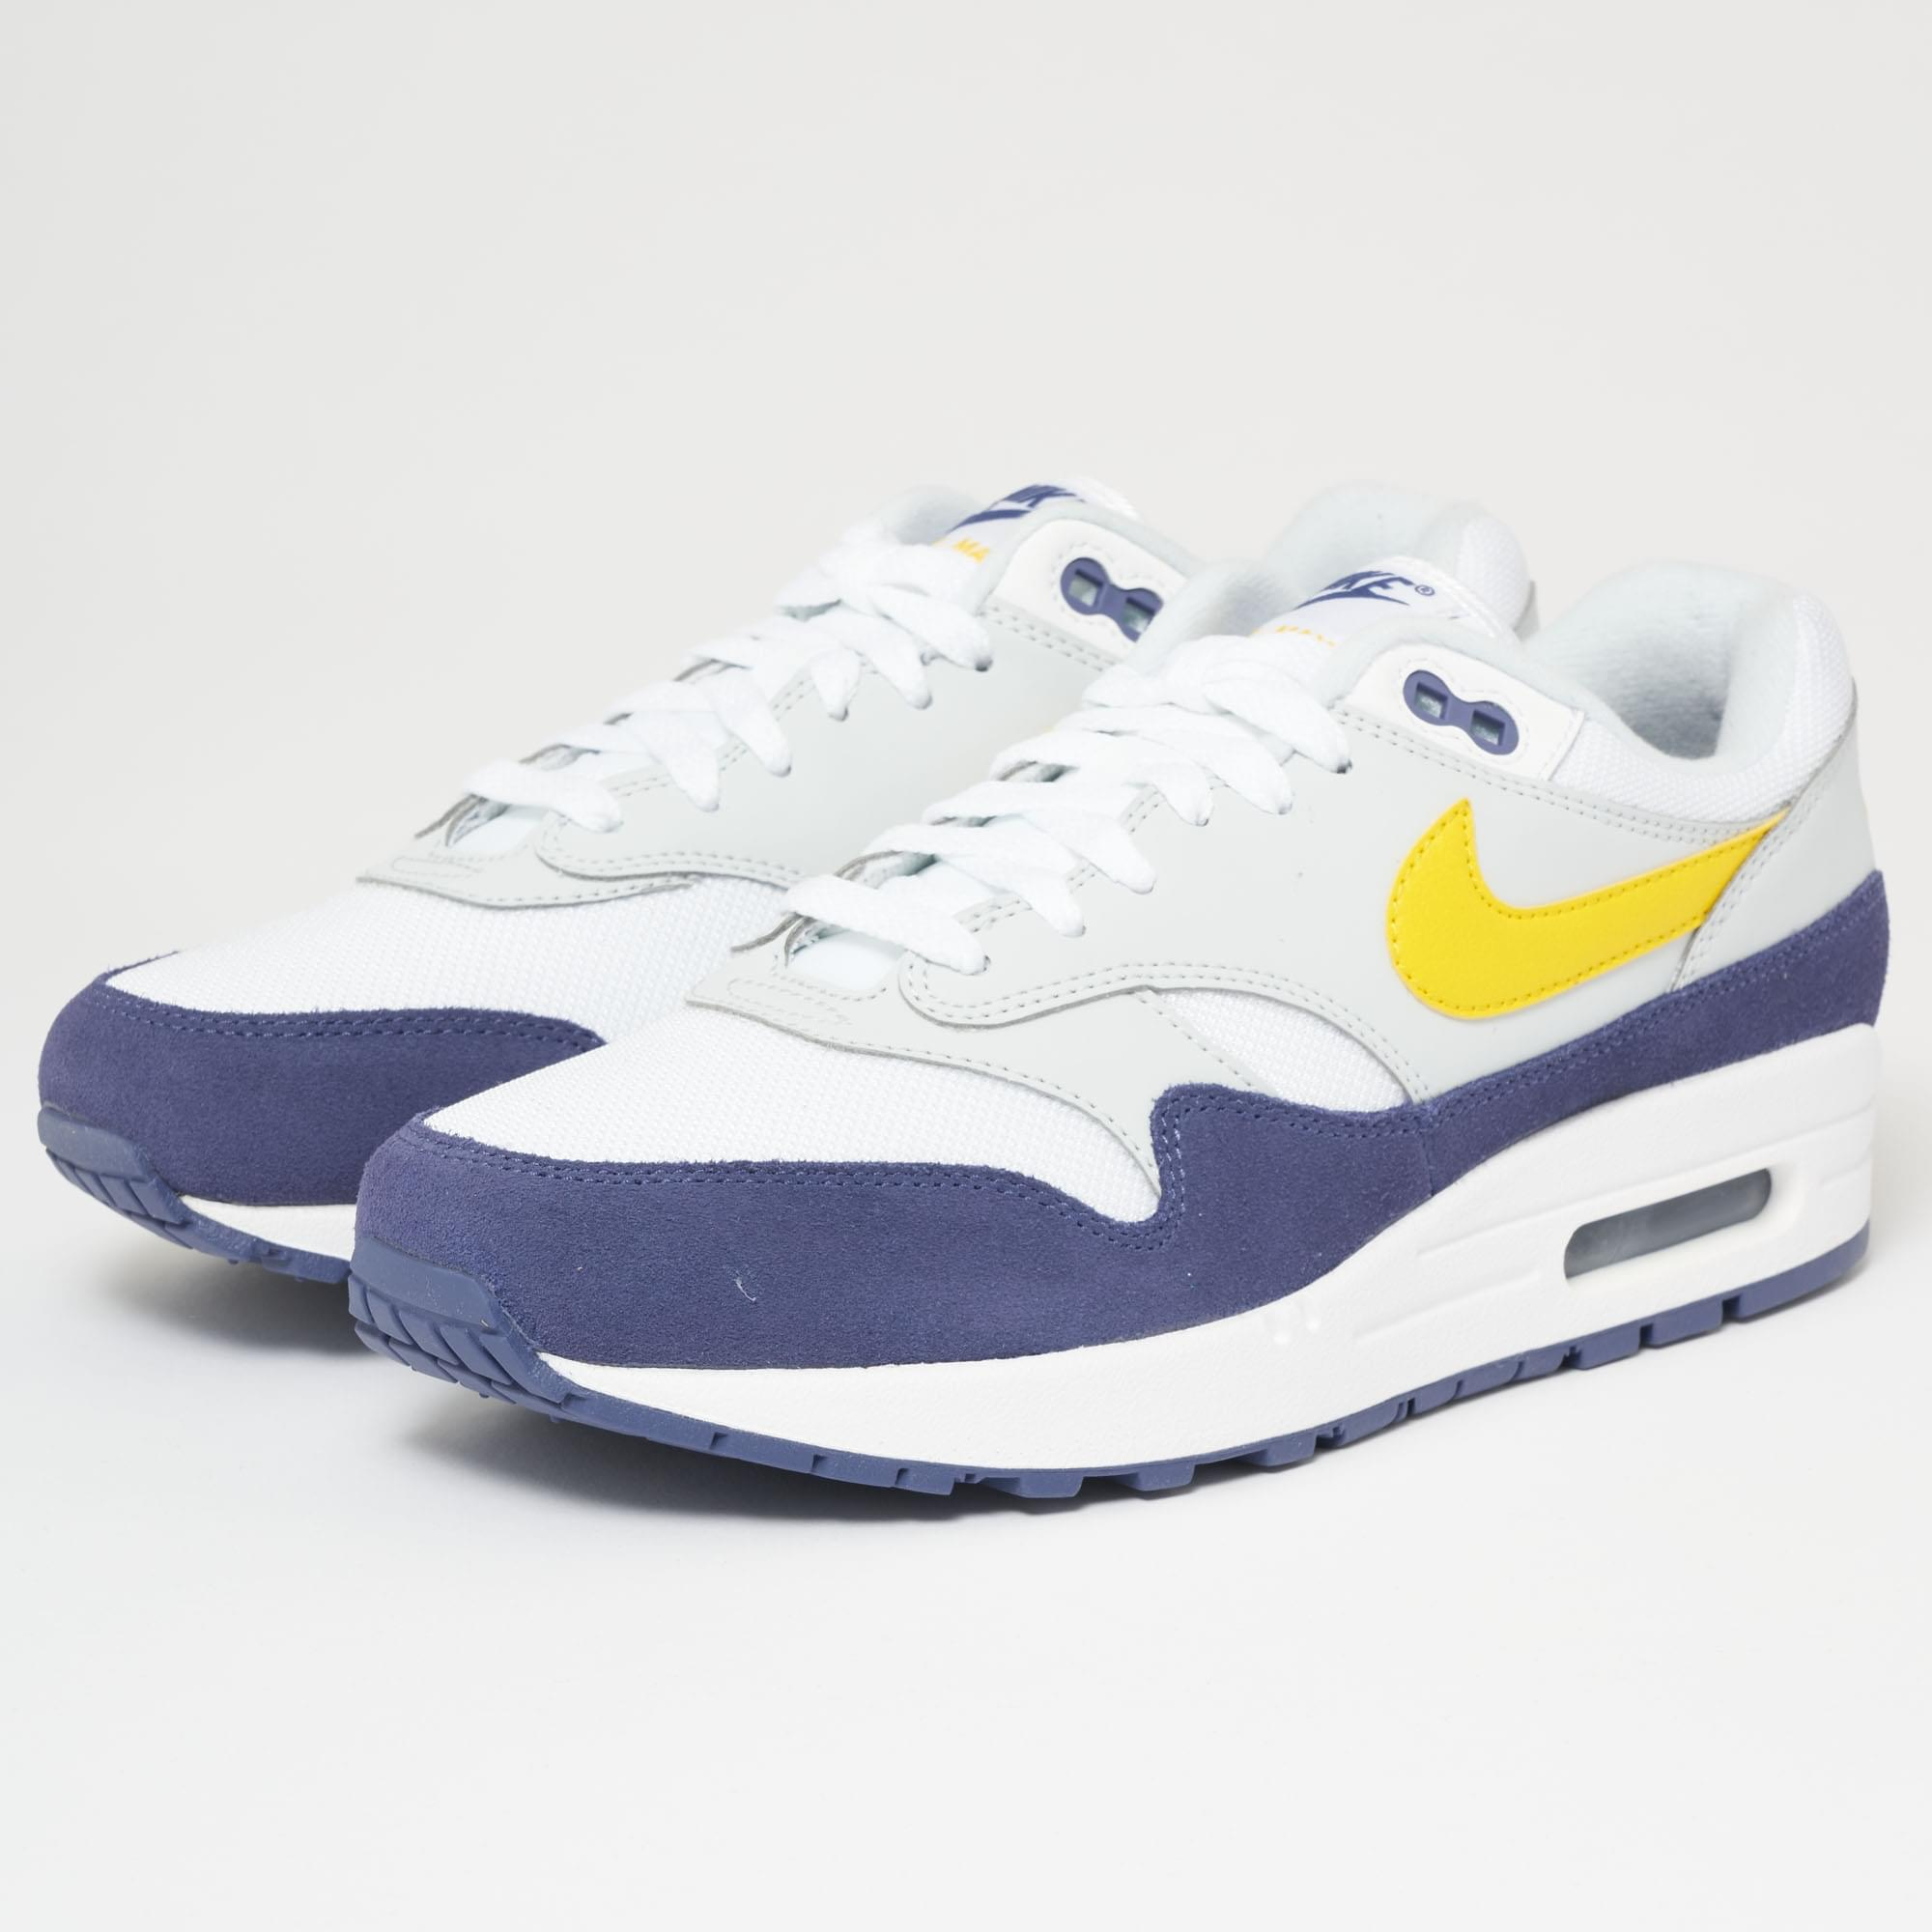 timeless design d01b4 67b75 Nike Air Max 1 - White, Blue Recall, Pure Platinum   Tour Yellow in ...